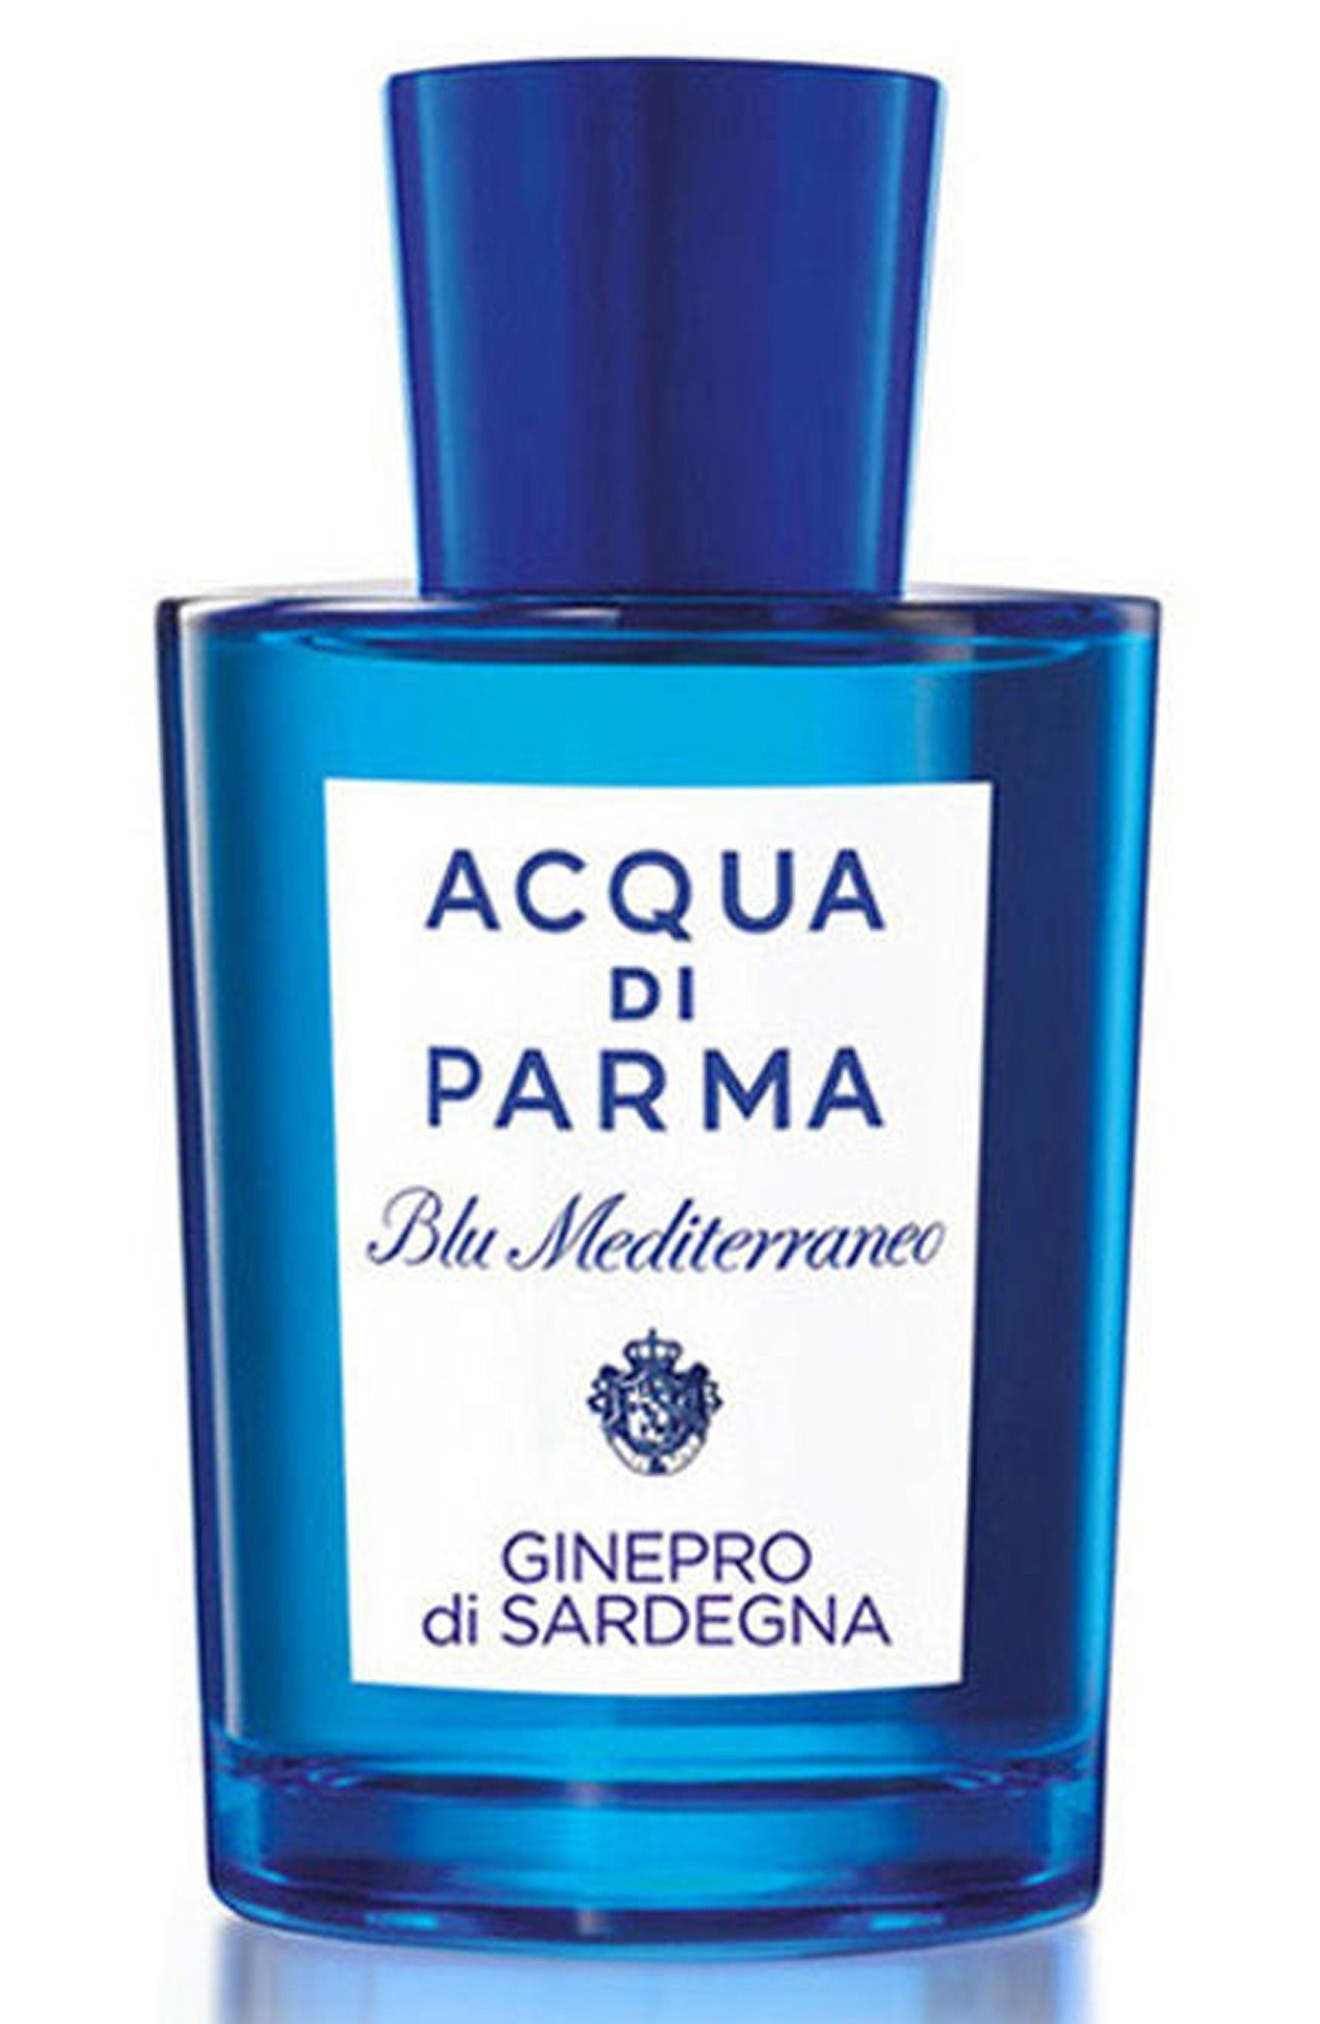 Acqua di Parma 'Blu Mediterraneo' Ginepro di Sardegna Eau de Toilette